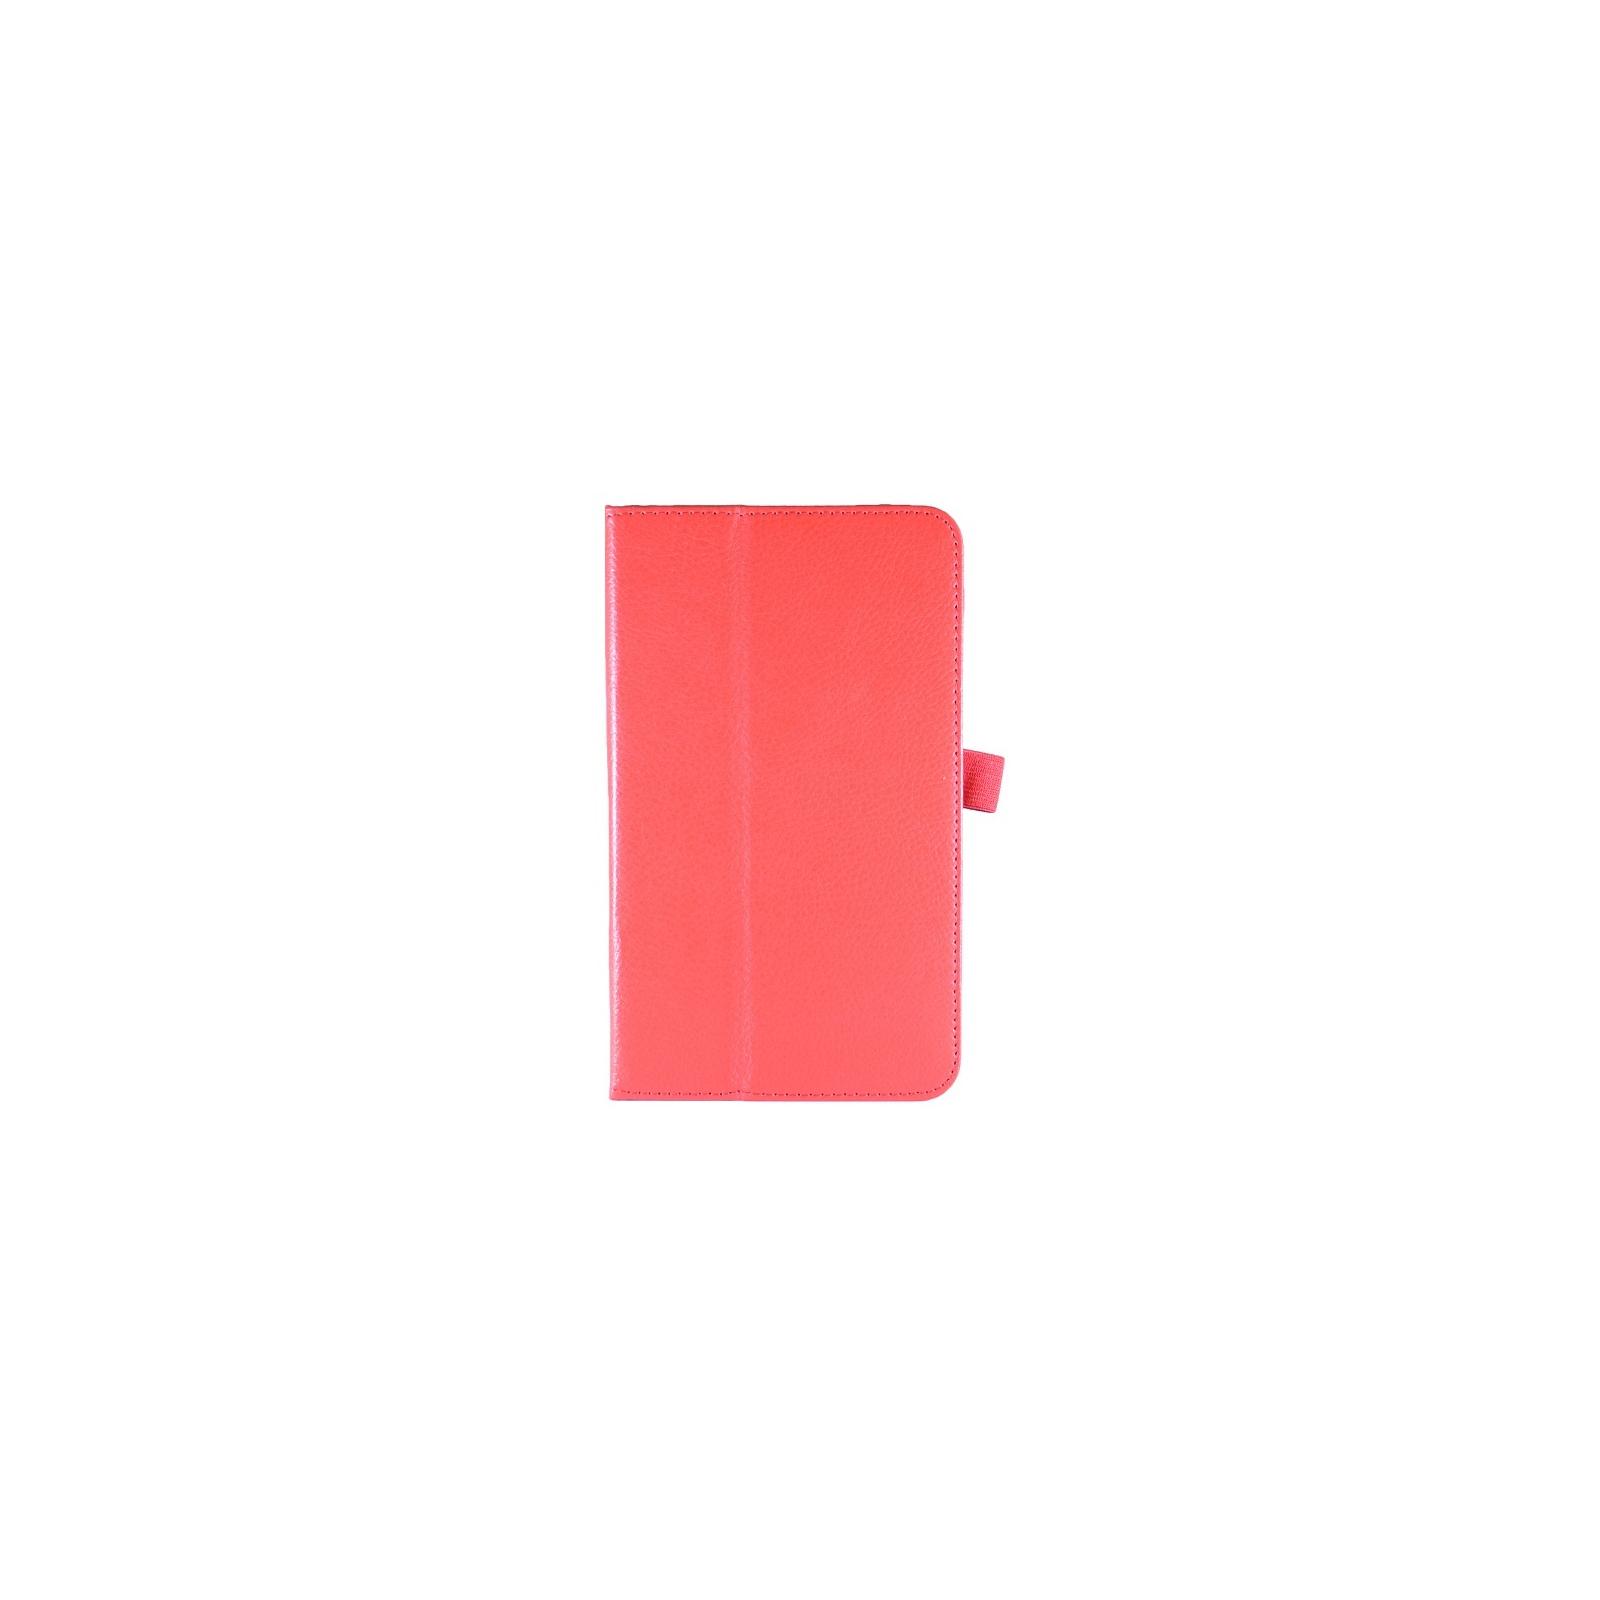 "Чехол для планшета Pro-case 7"" Asus MeMO Pad ME170 red (ME170r)"